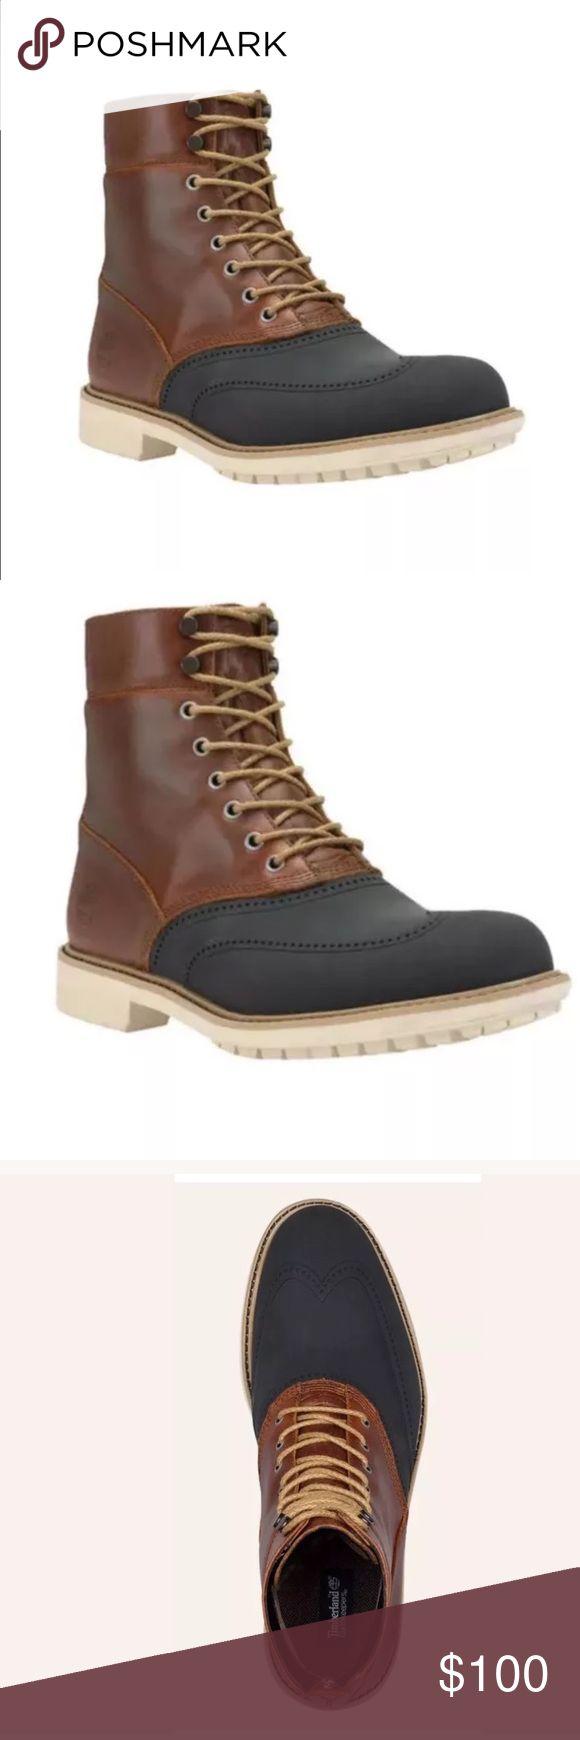 Men's TIMBERLAND shoes Timberland Men's Stormbuck Tall Waterproof Duck Boots NWT Timberland Shoes